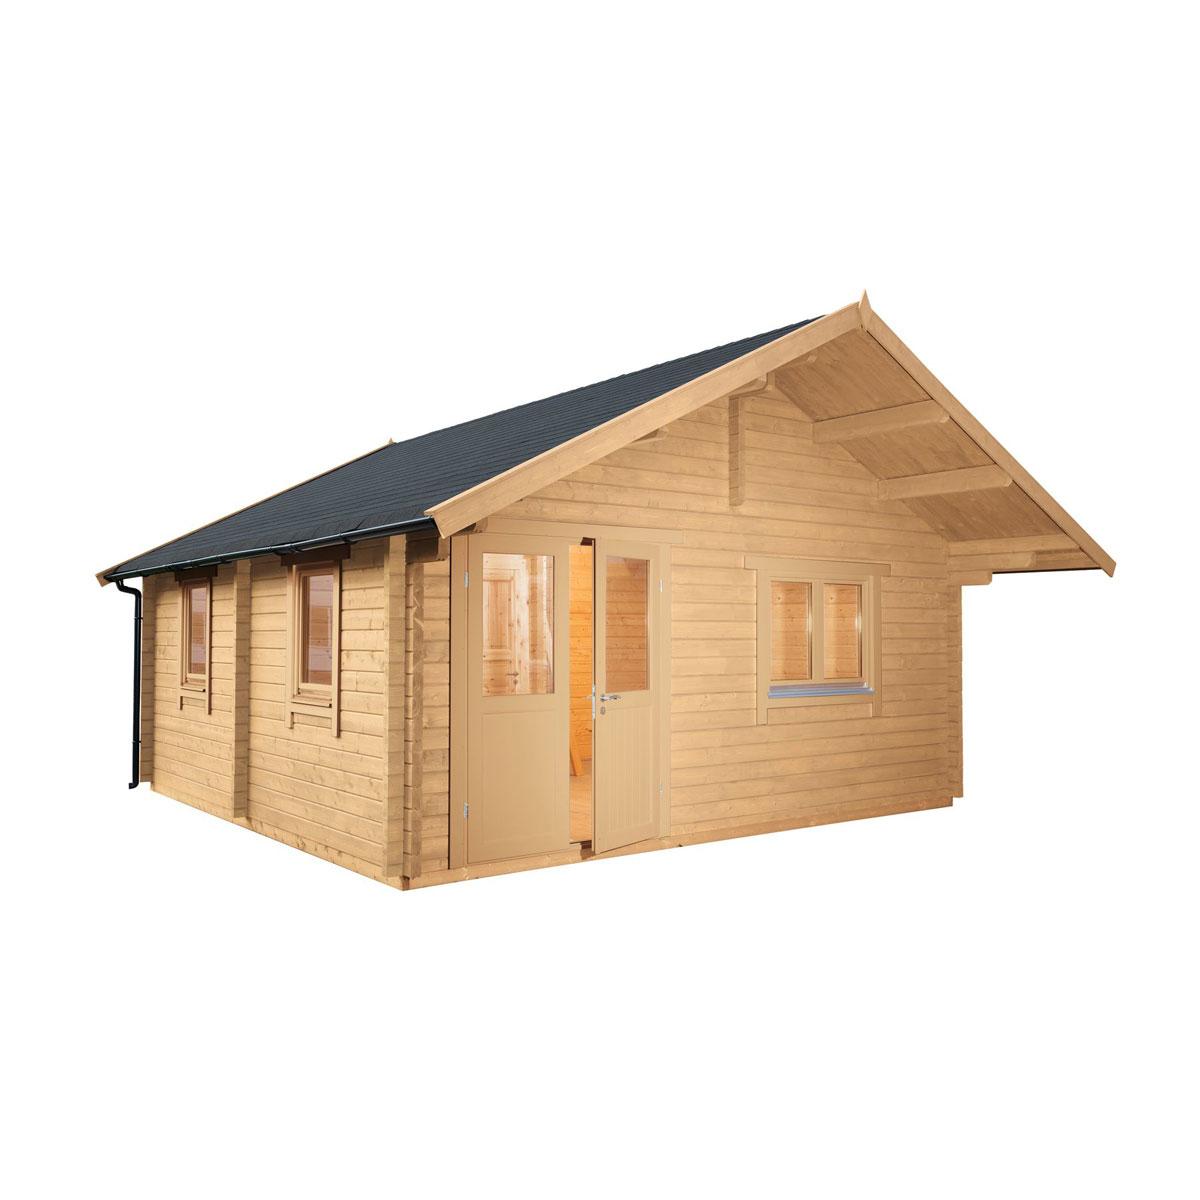 "Wolff Finnhaus Gartenhaus ""Lappland 70-A XL"", mit Schlafboden"